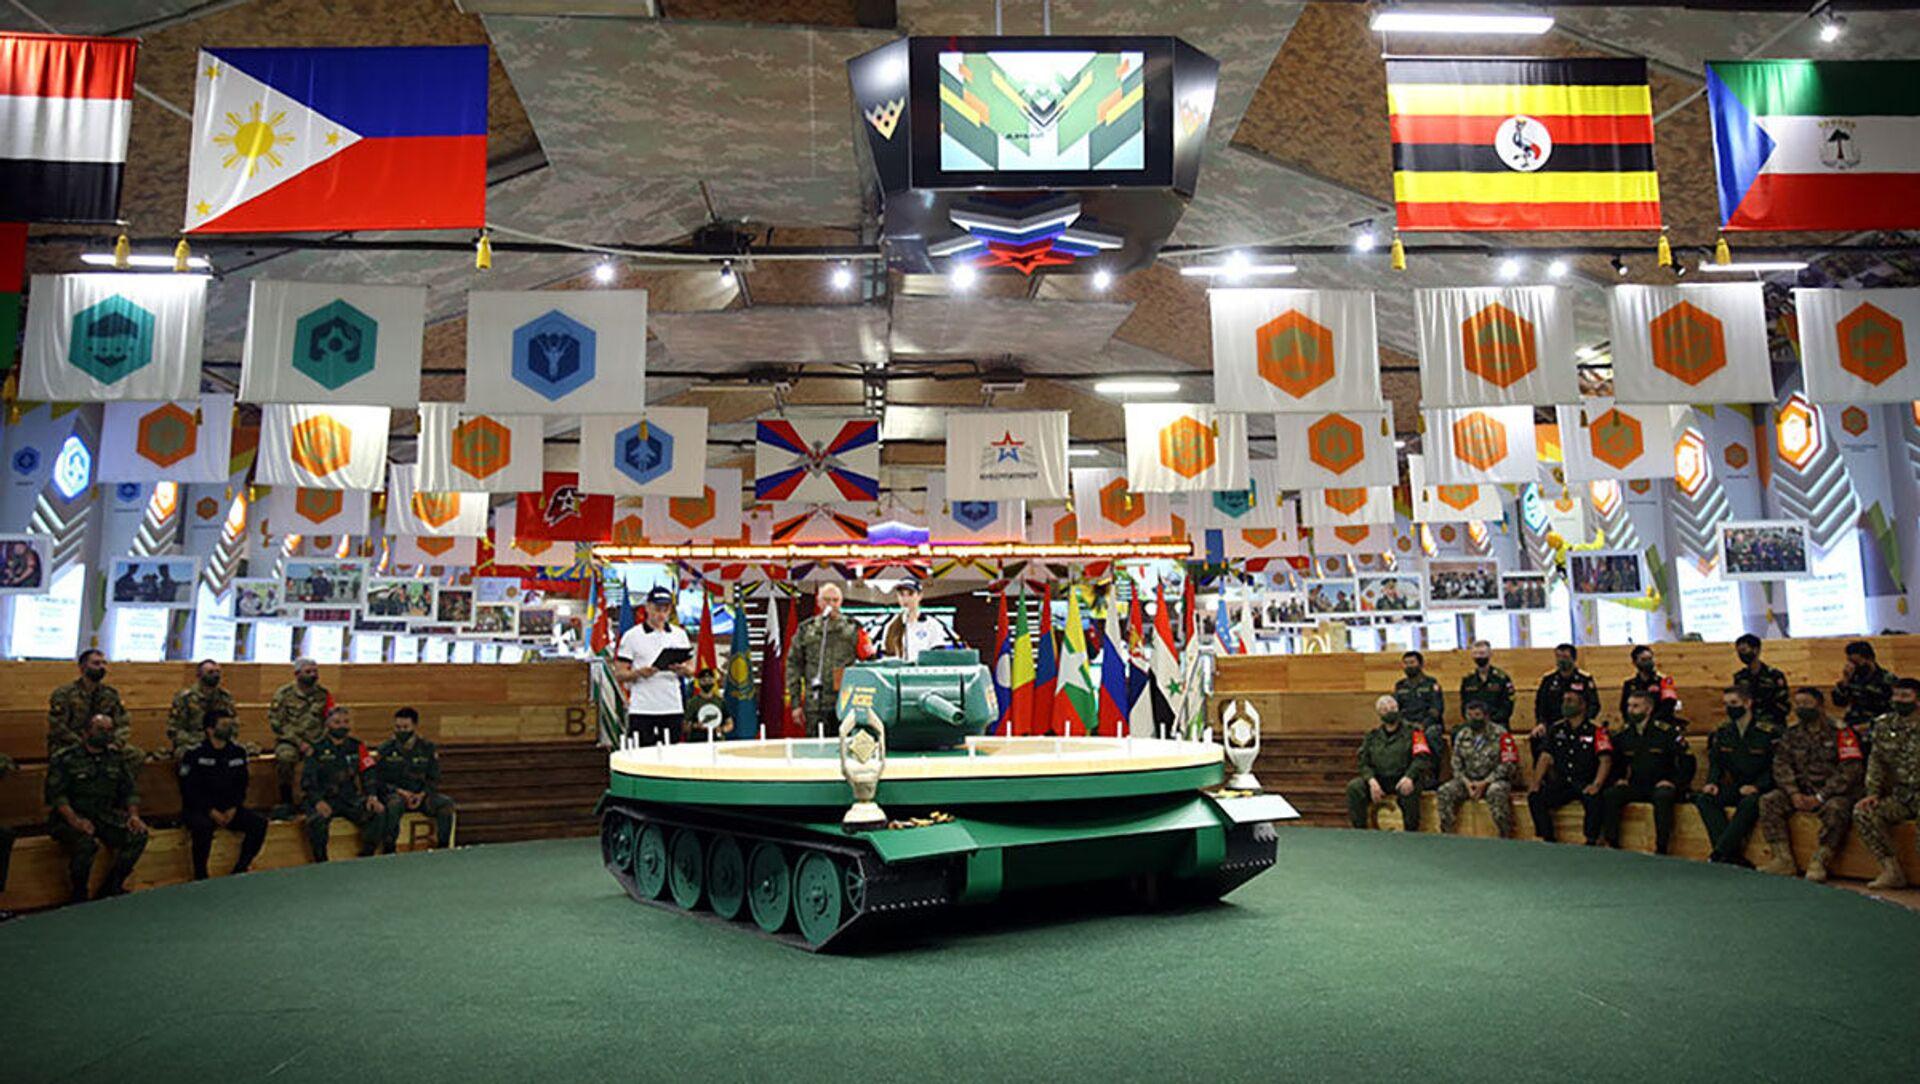 Жеребьевка команд-участниц полуфинала конкурса «Танковый биатлон» - Sputnik Азербайджан, 1920, 30.08.2021